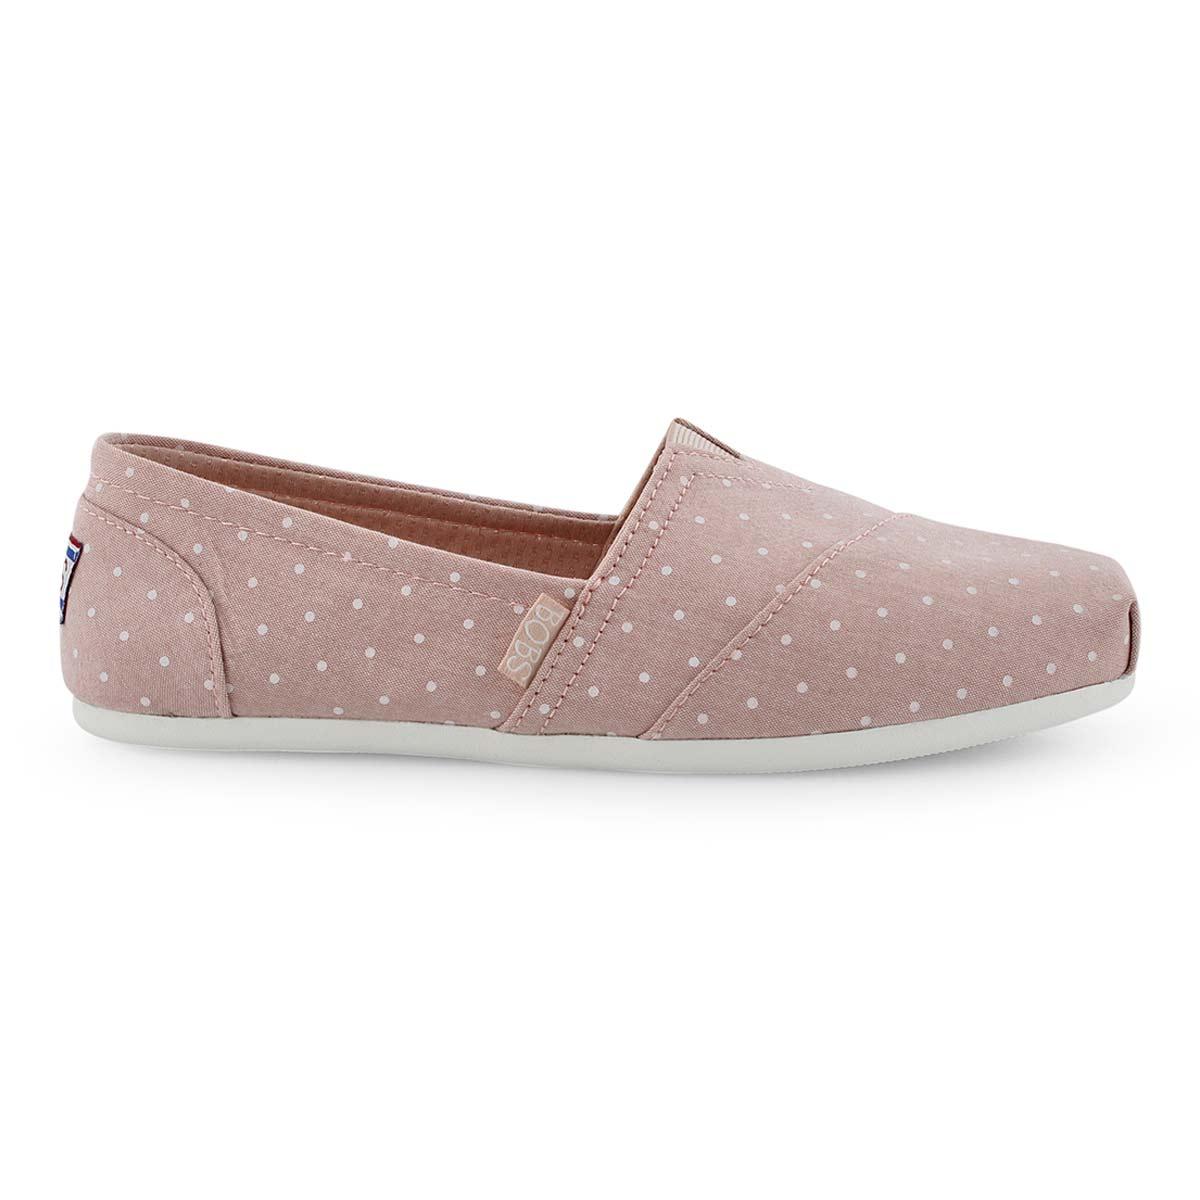 Lds Bobs Plush Hot Spot pink dot slip on